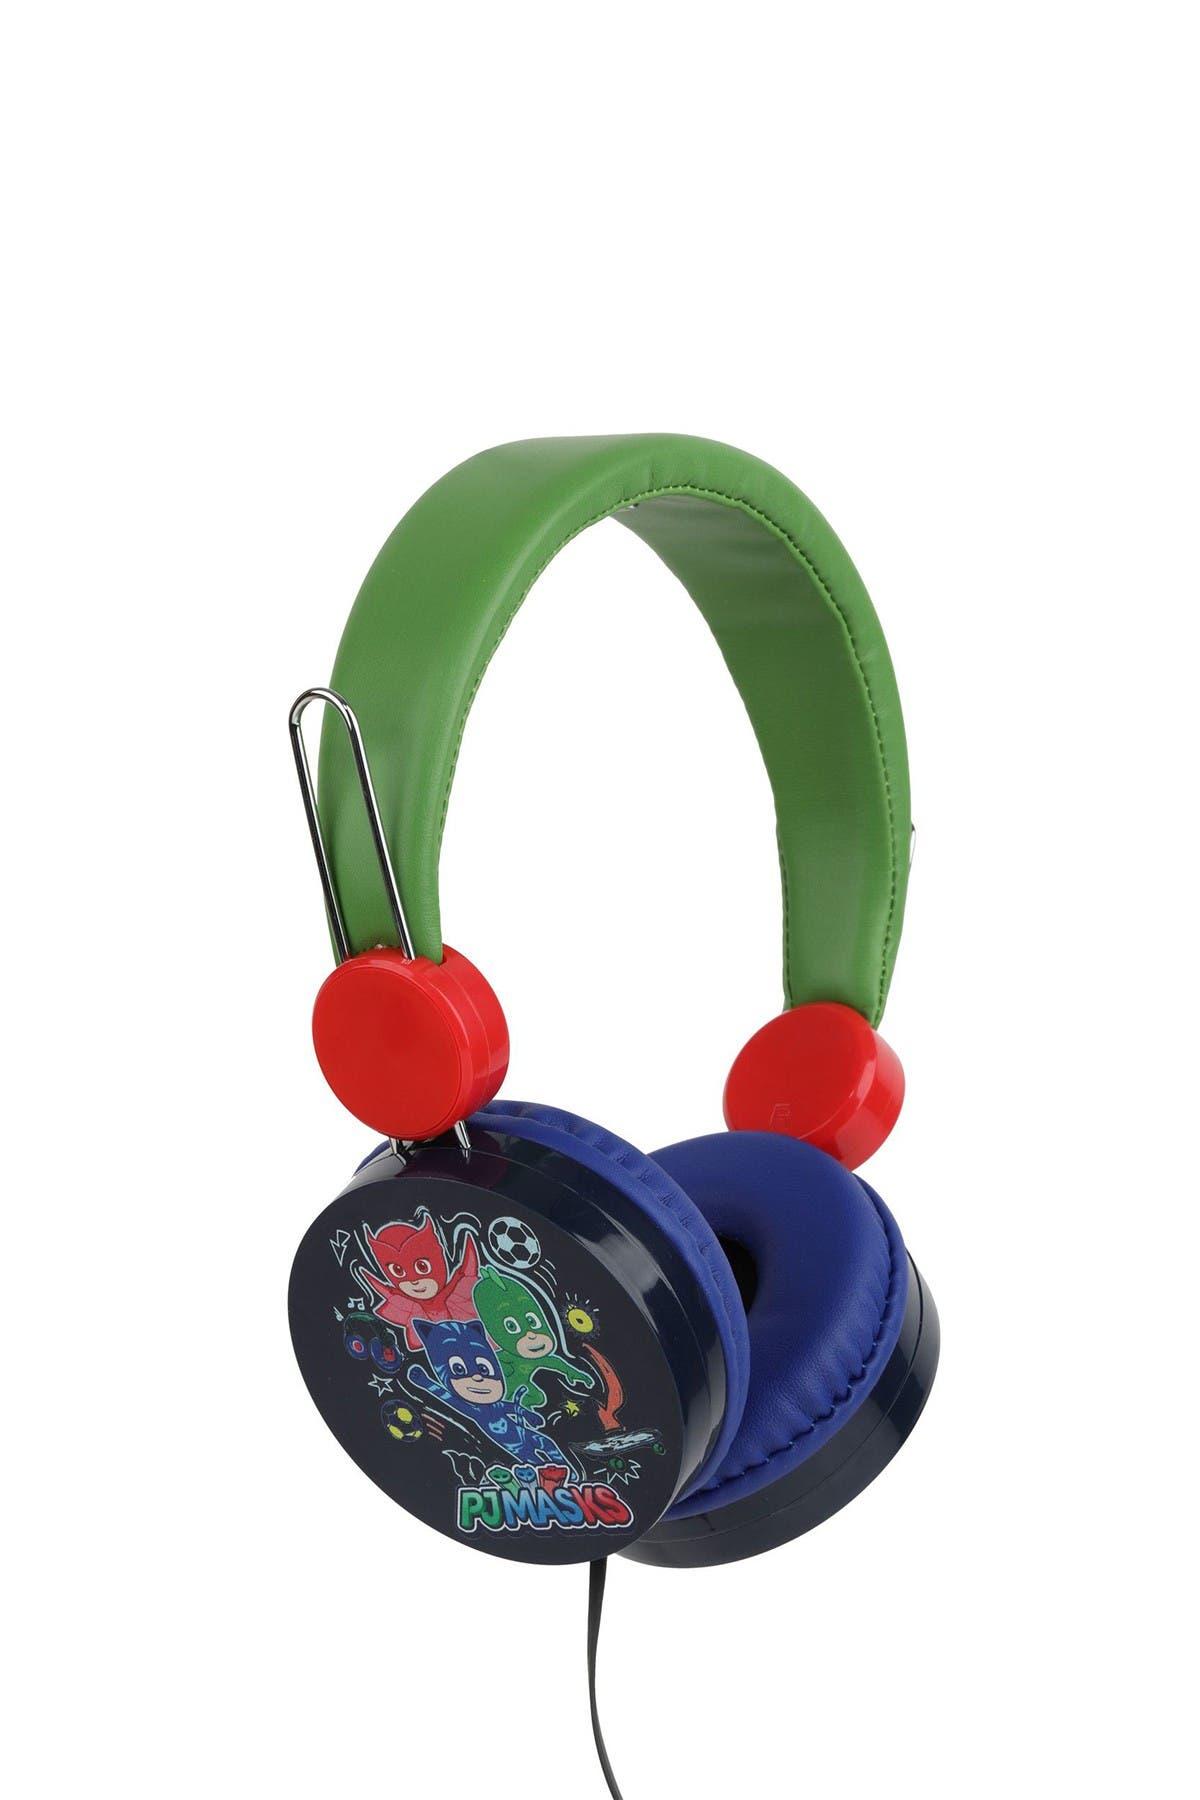 Image of VIVITAR PJ Mask Kids Safe Headphones